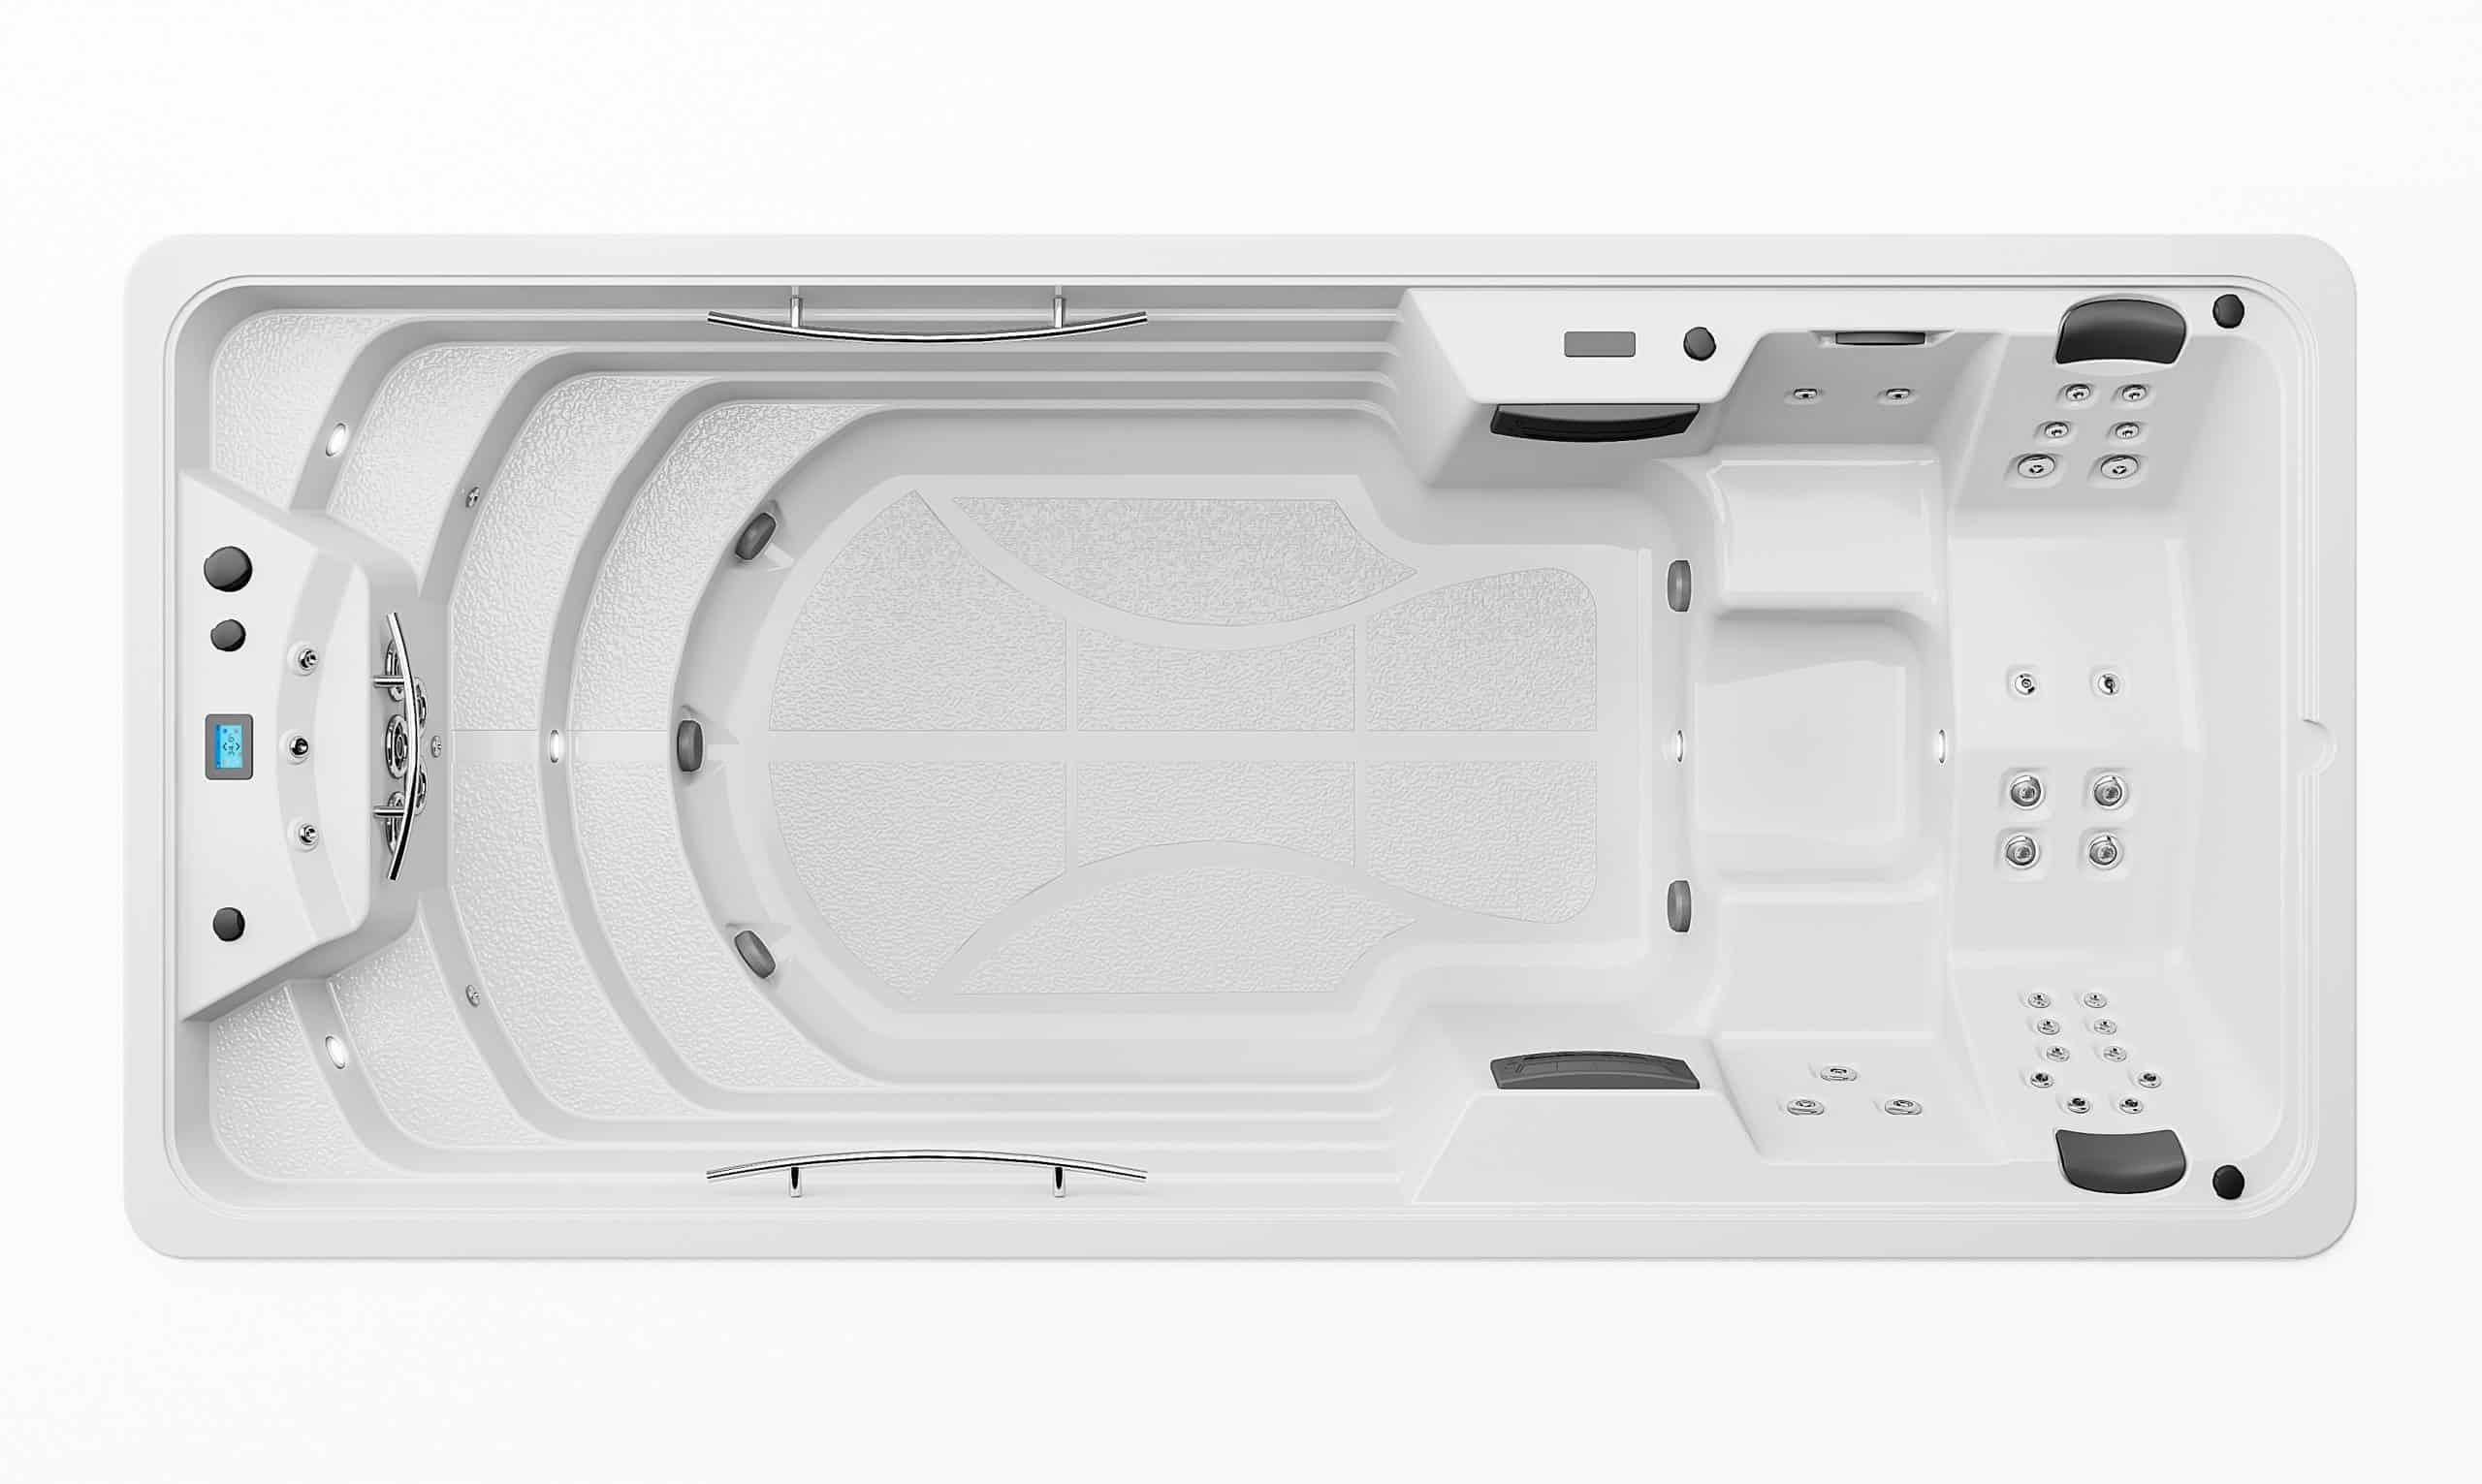 AquaviaSpa model Amazon